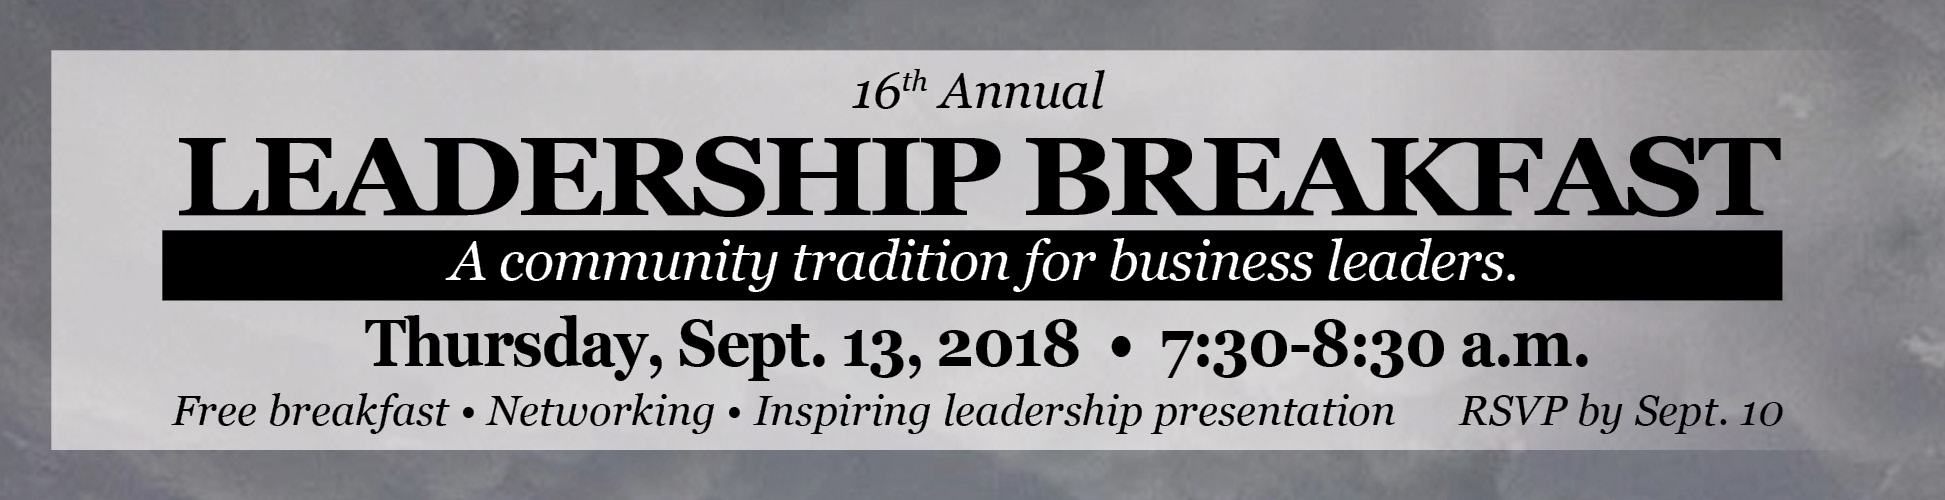 leadership breakfast 2018 small banner